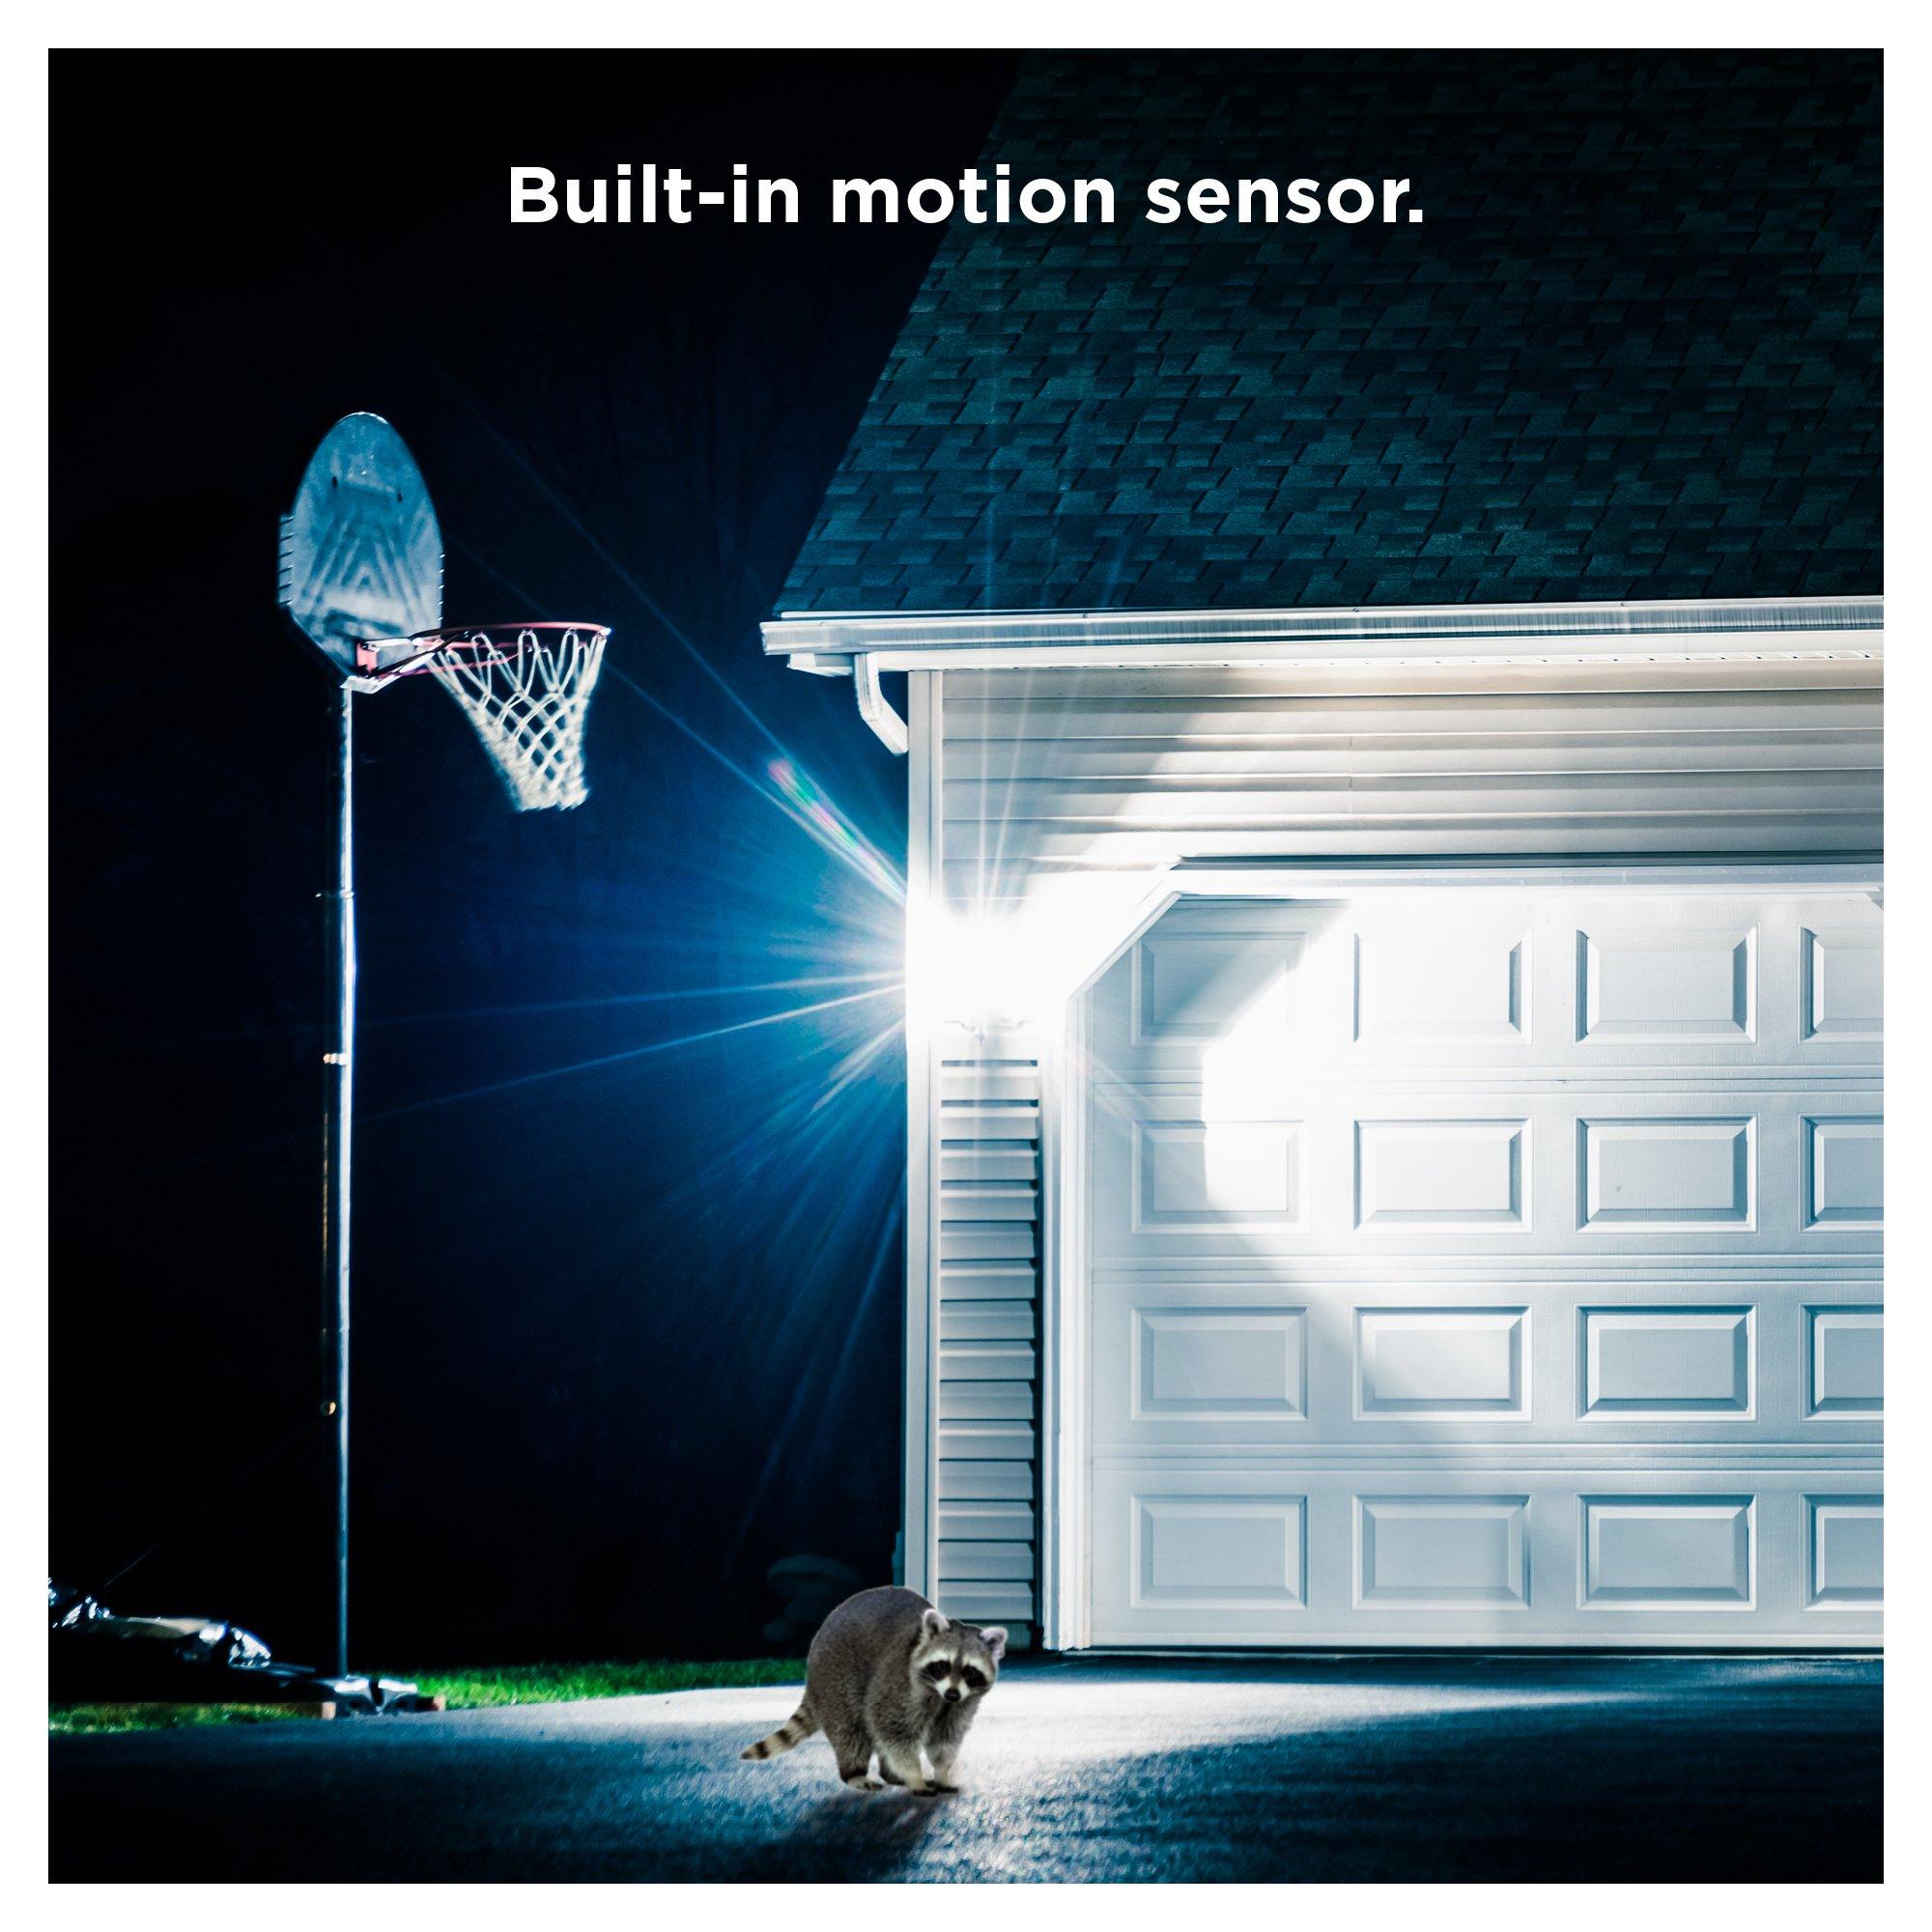 Sengled LED Flood Light with Motion Sensor & Daylight Sensor, Smart LED Light Bulb PAR38, Dusk to Dawn Bulb, Waterproof 3000K for Outdoor Use, 2 Pack by Sengled (Image #5)